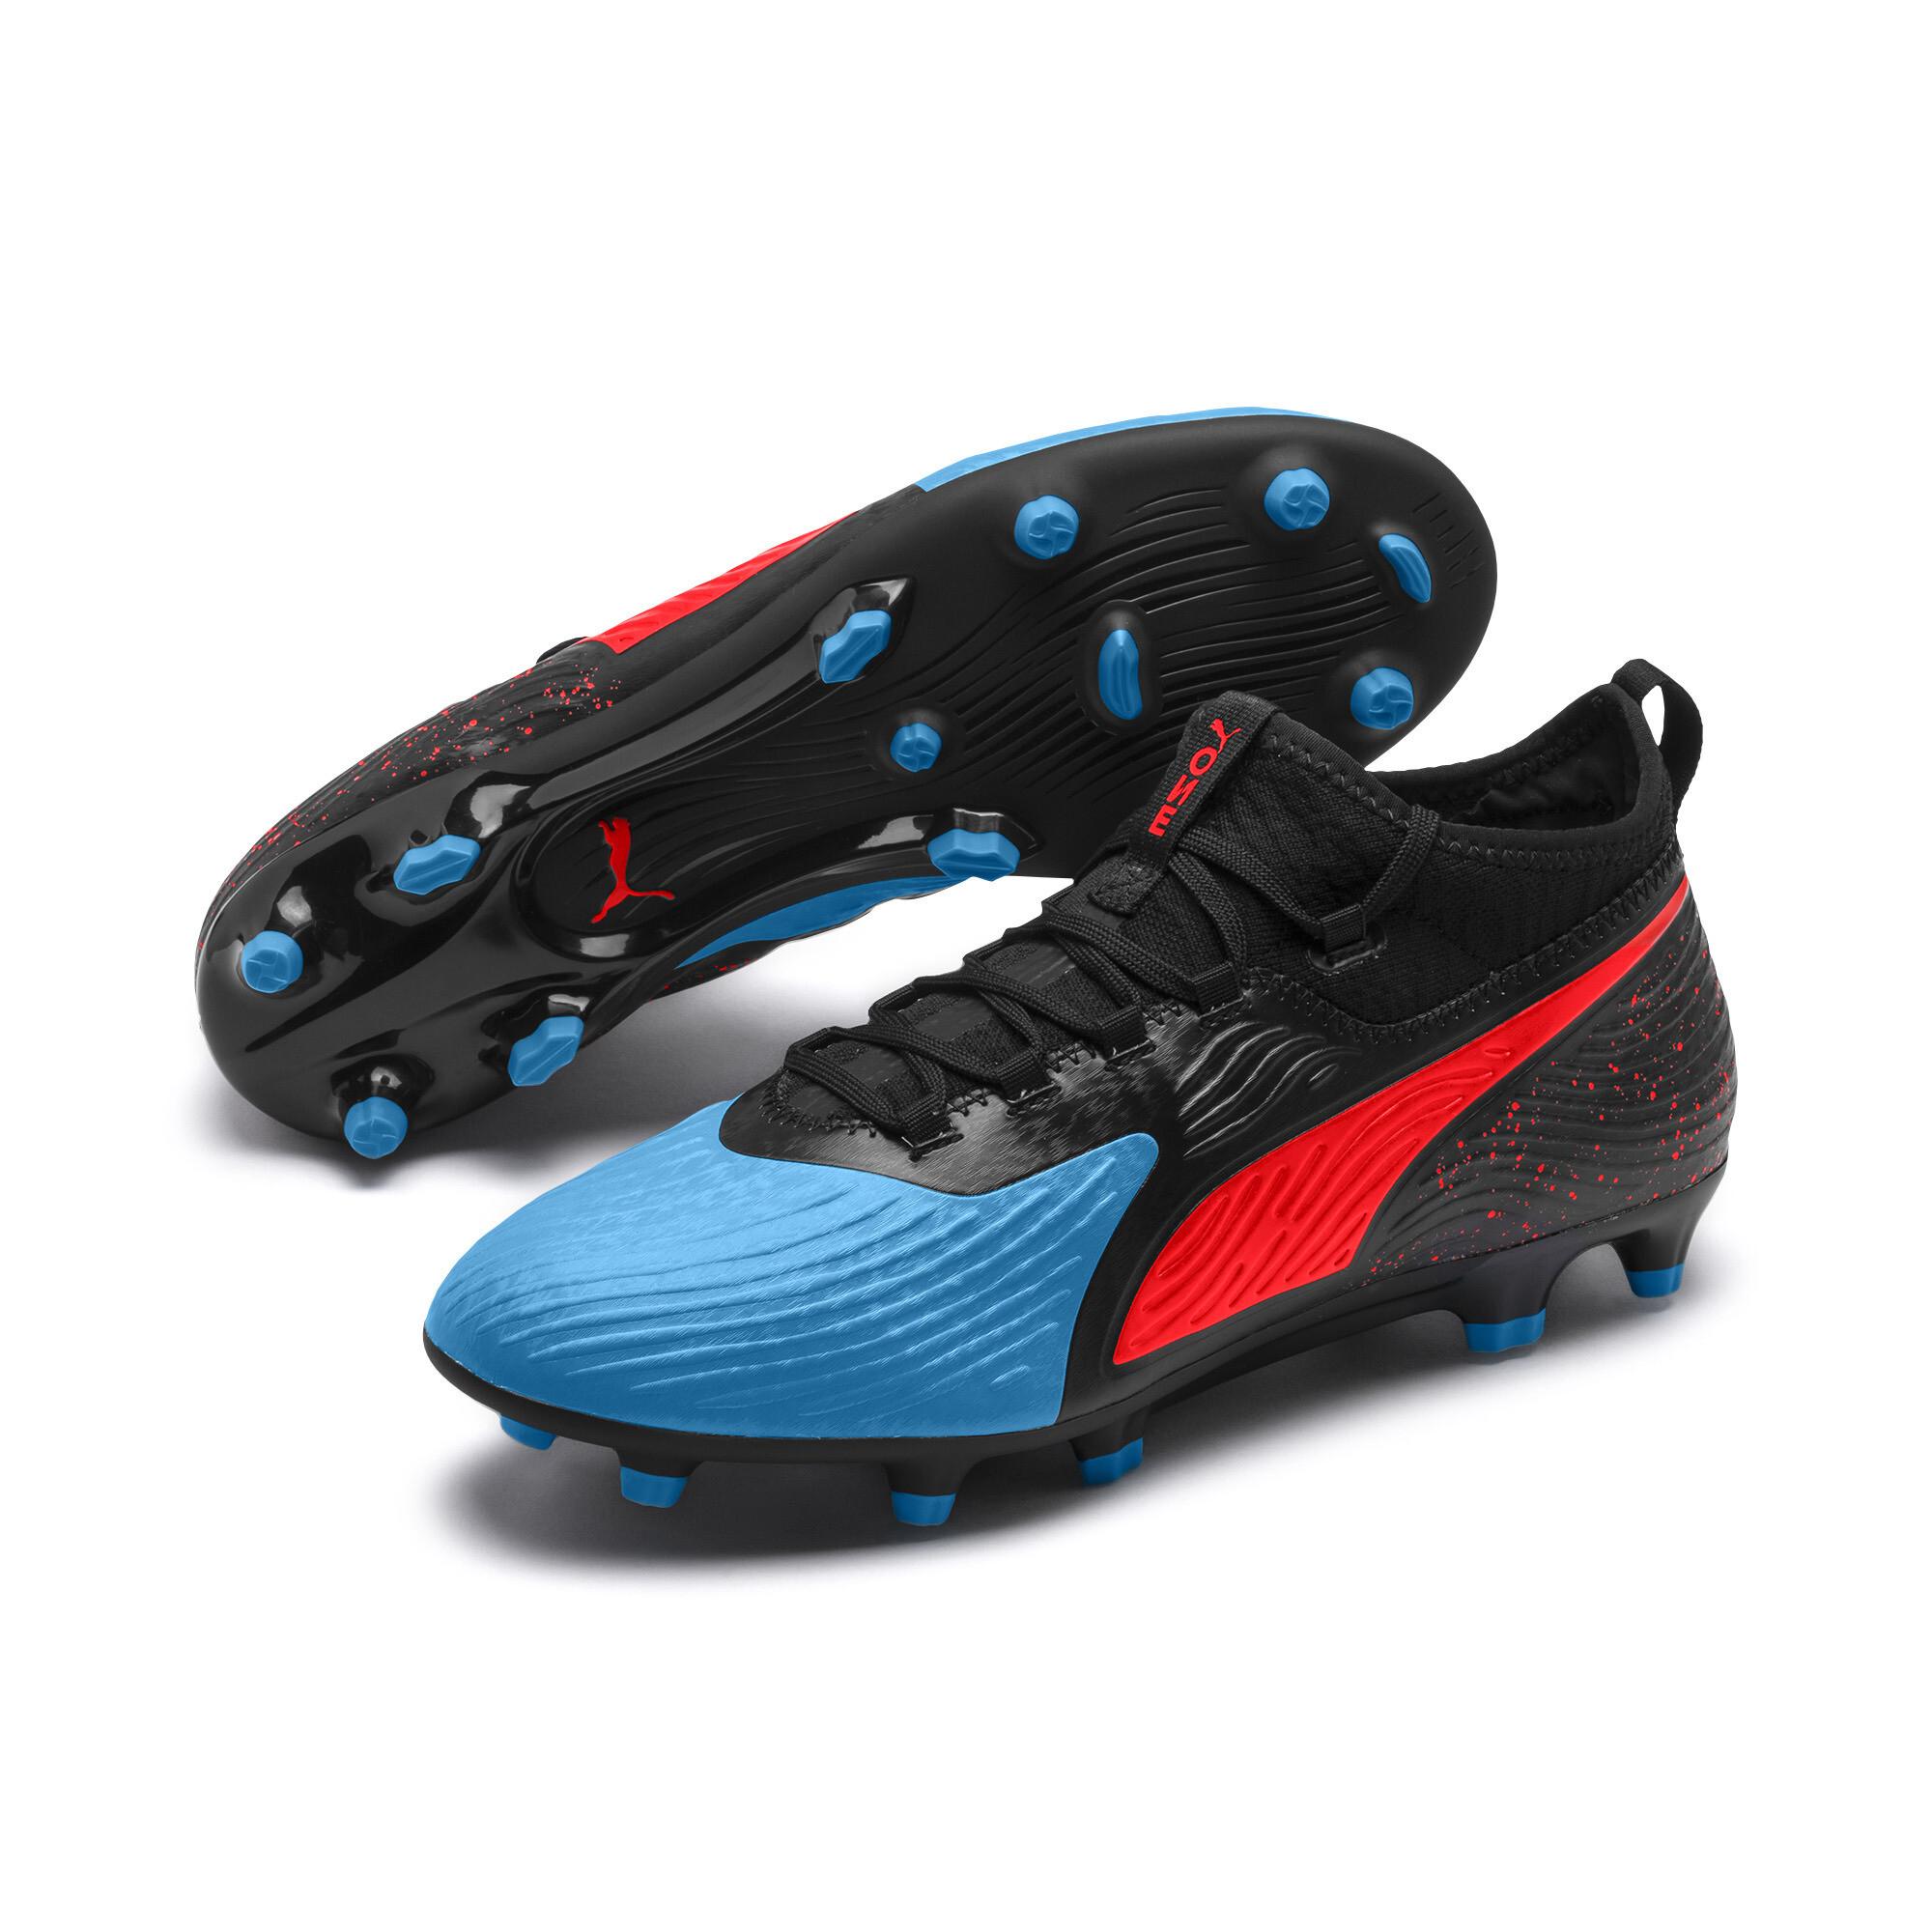 Image Puma PUMA ONE 19.3 Syn FG/AG Men's Football Boots #2